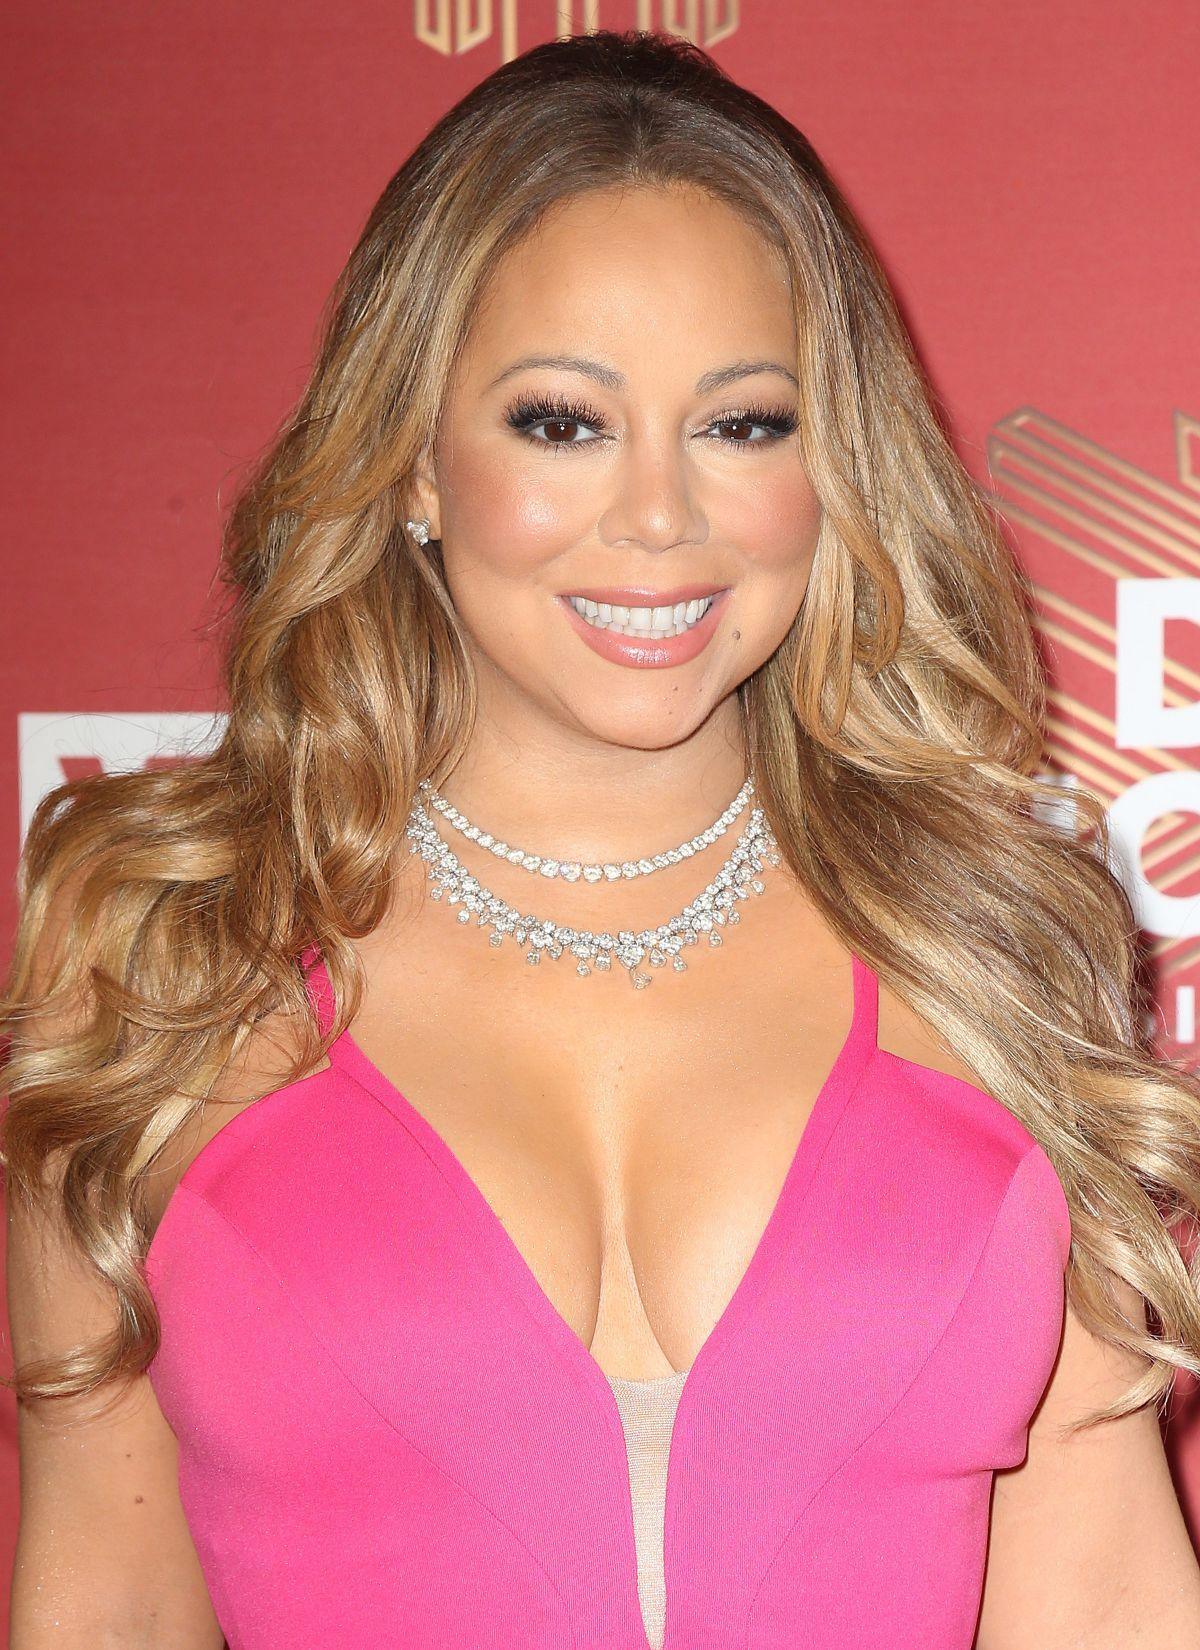 Mariah carey at vh1 s divas holiday unsilent night in new york 12 02 2016 hawtcelebs - Mariah carey diva ...